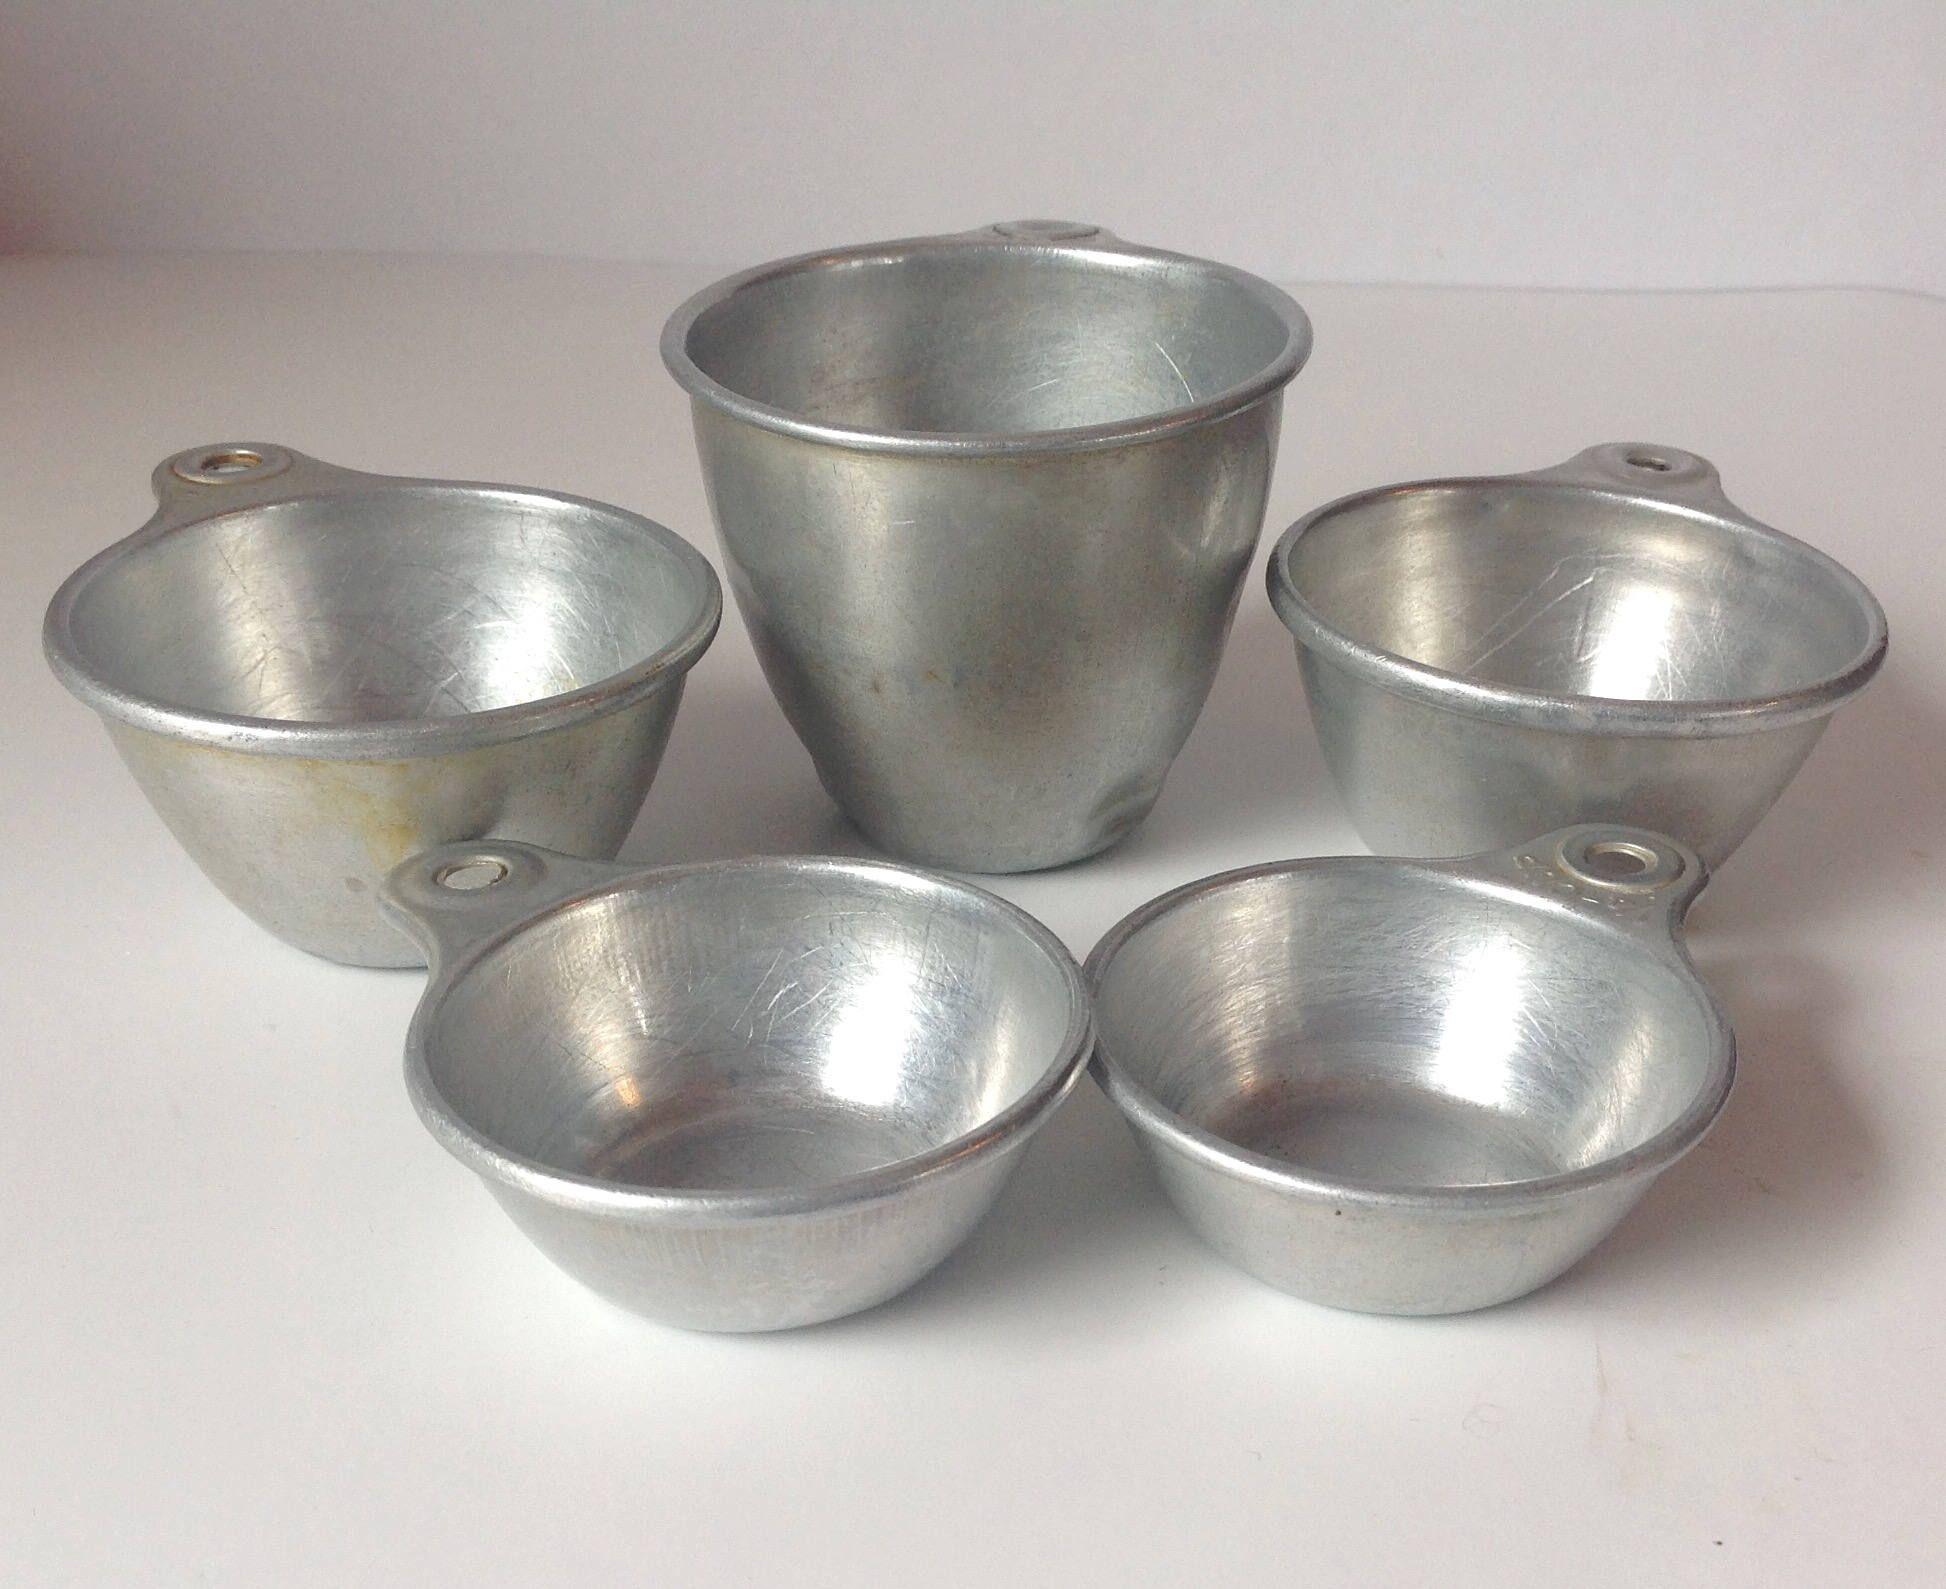 Vintage Aluminum Measuring Cup Set of 5 By Ekco 1 Cup, 2 1